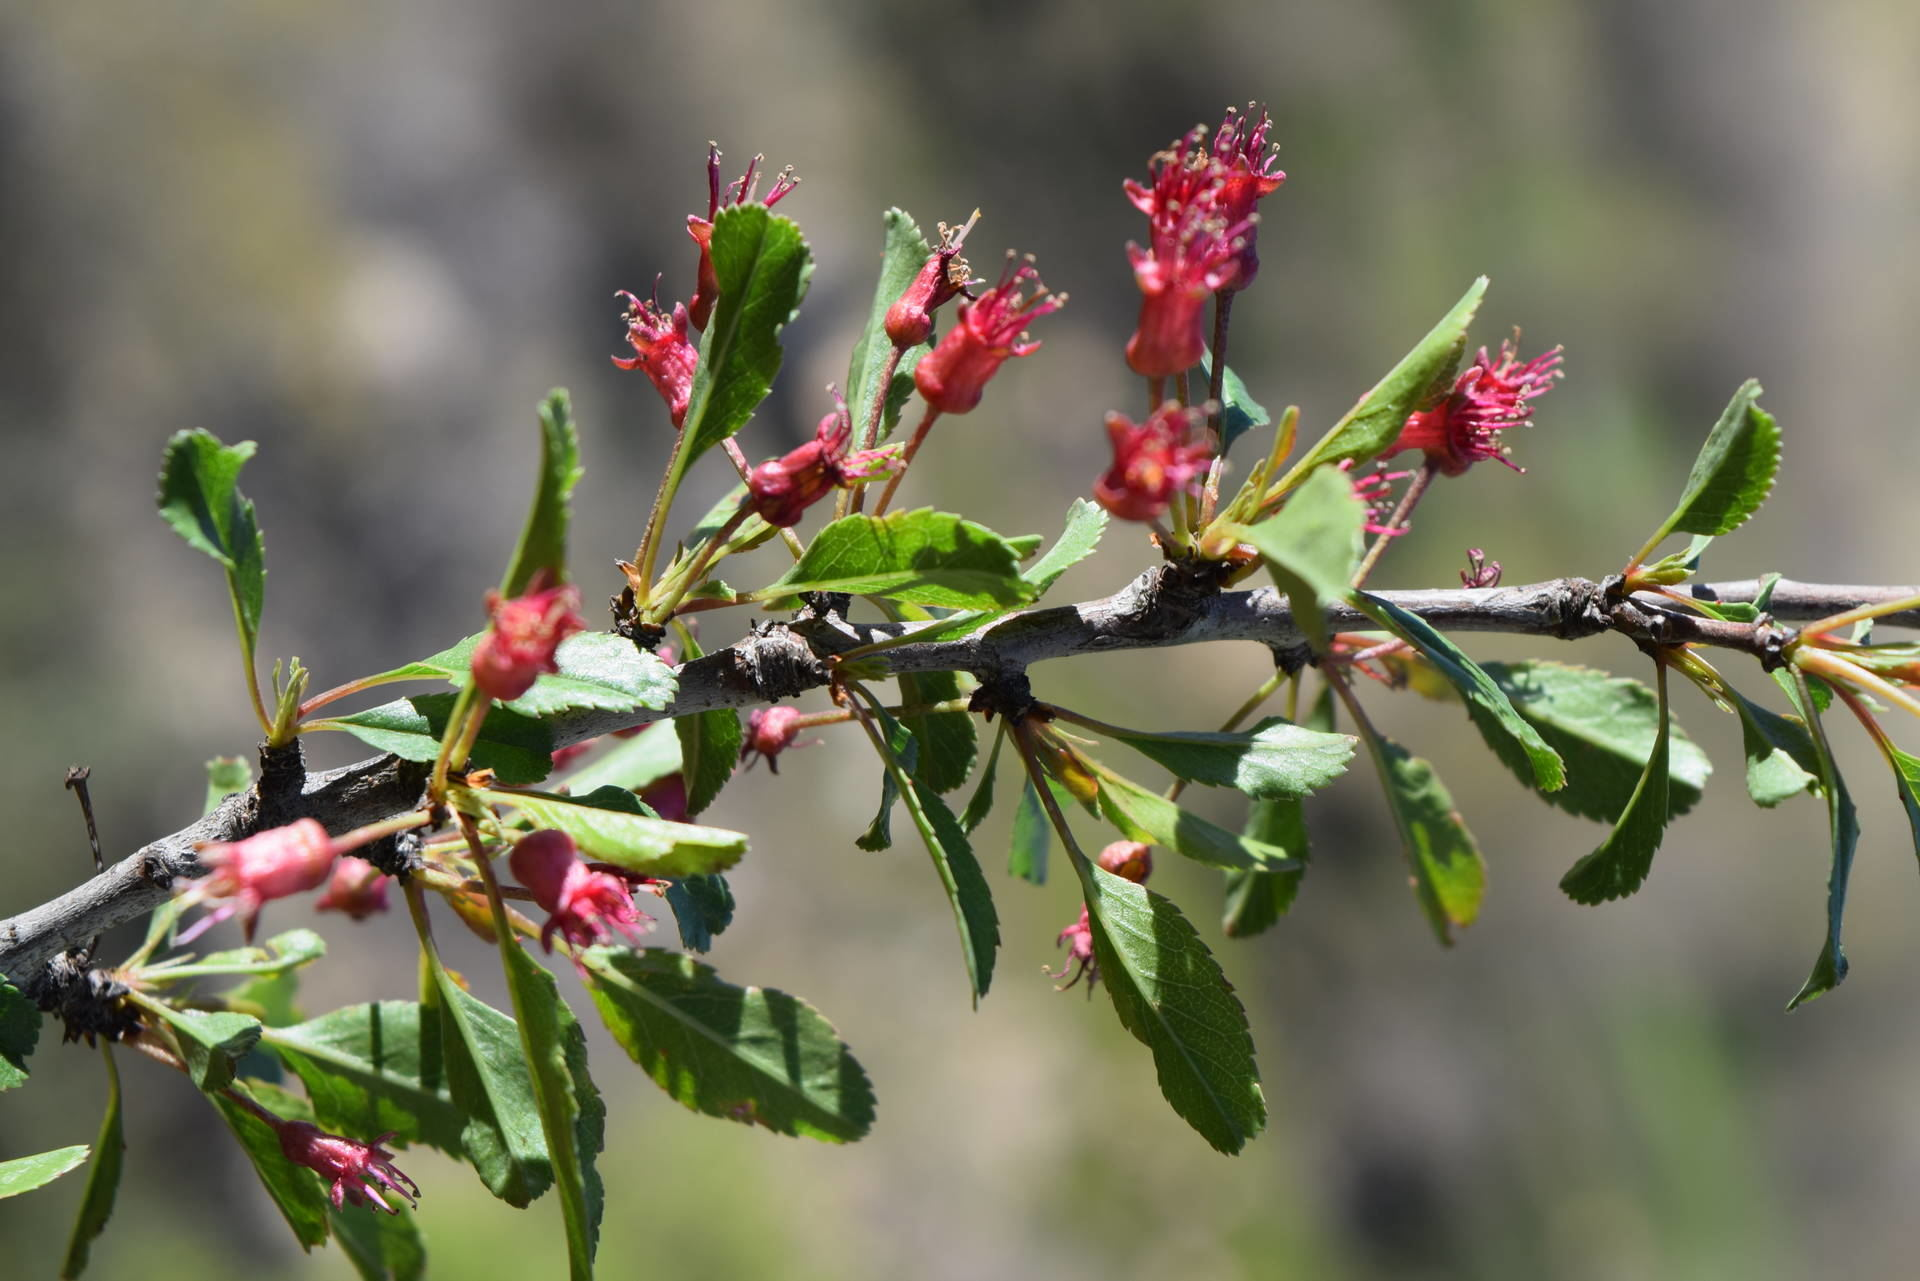 Prunus microcarpa C.A.Mey.